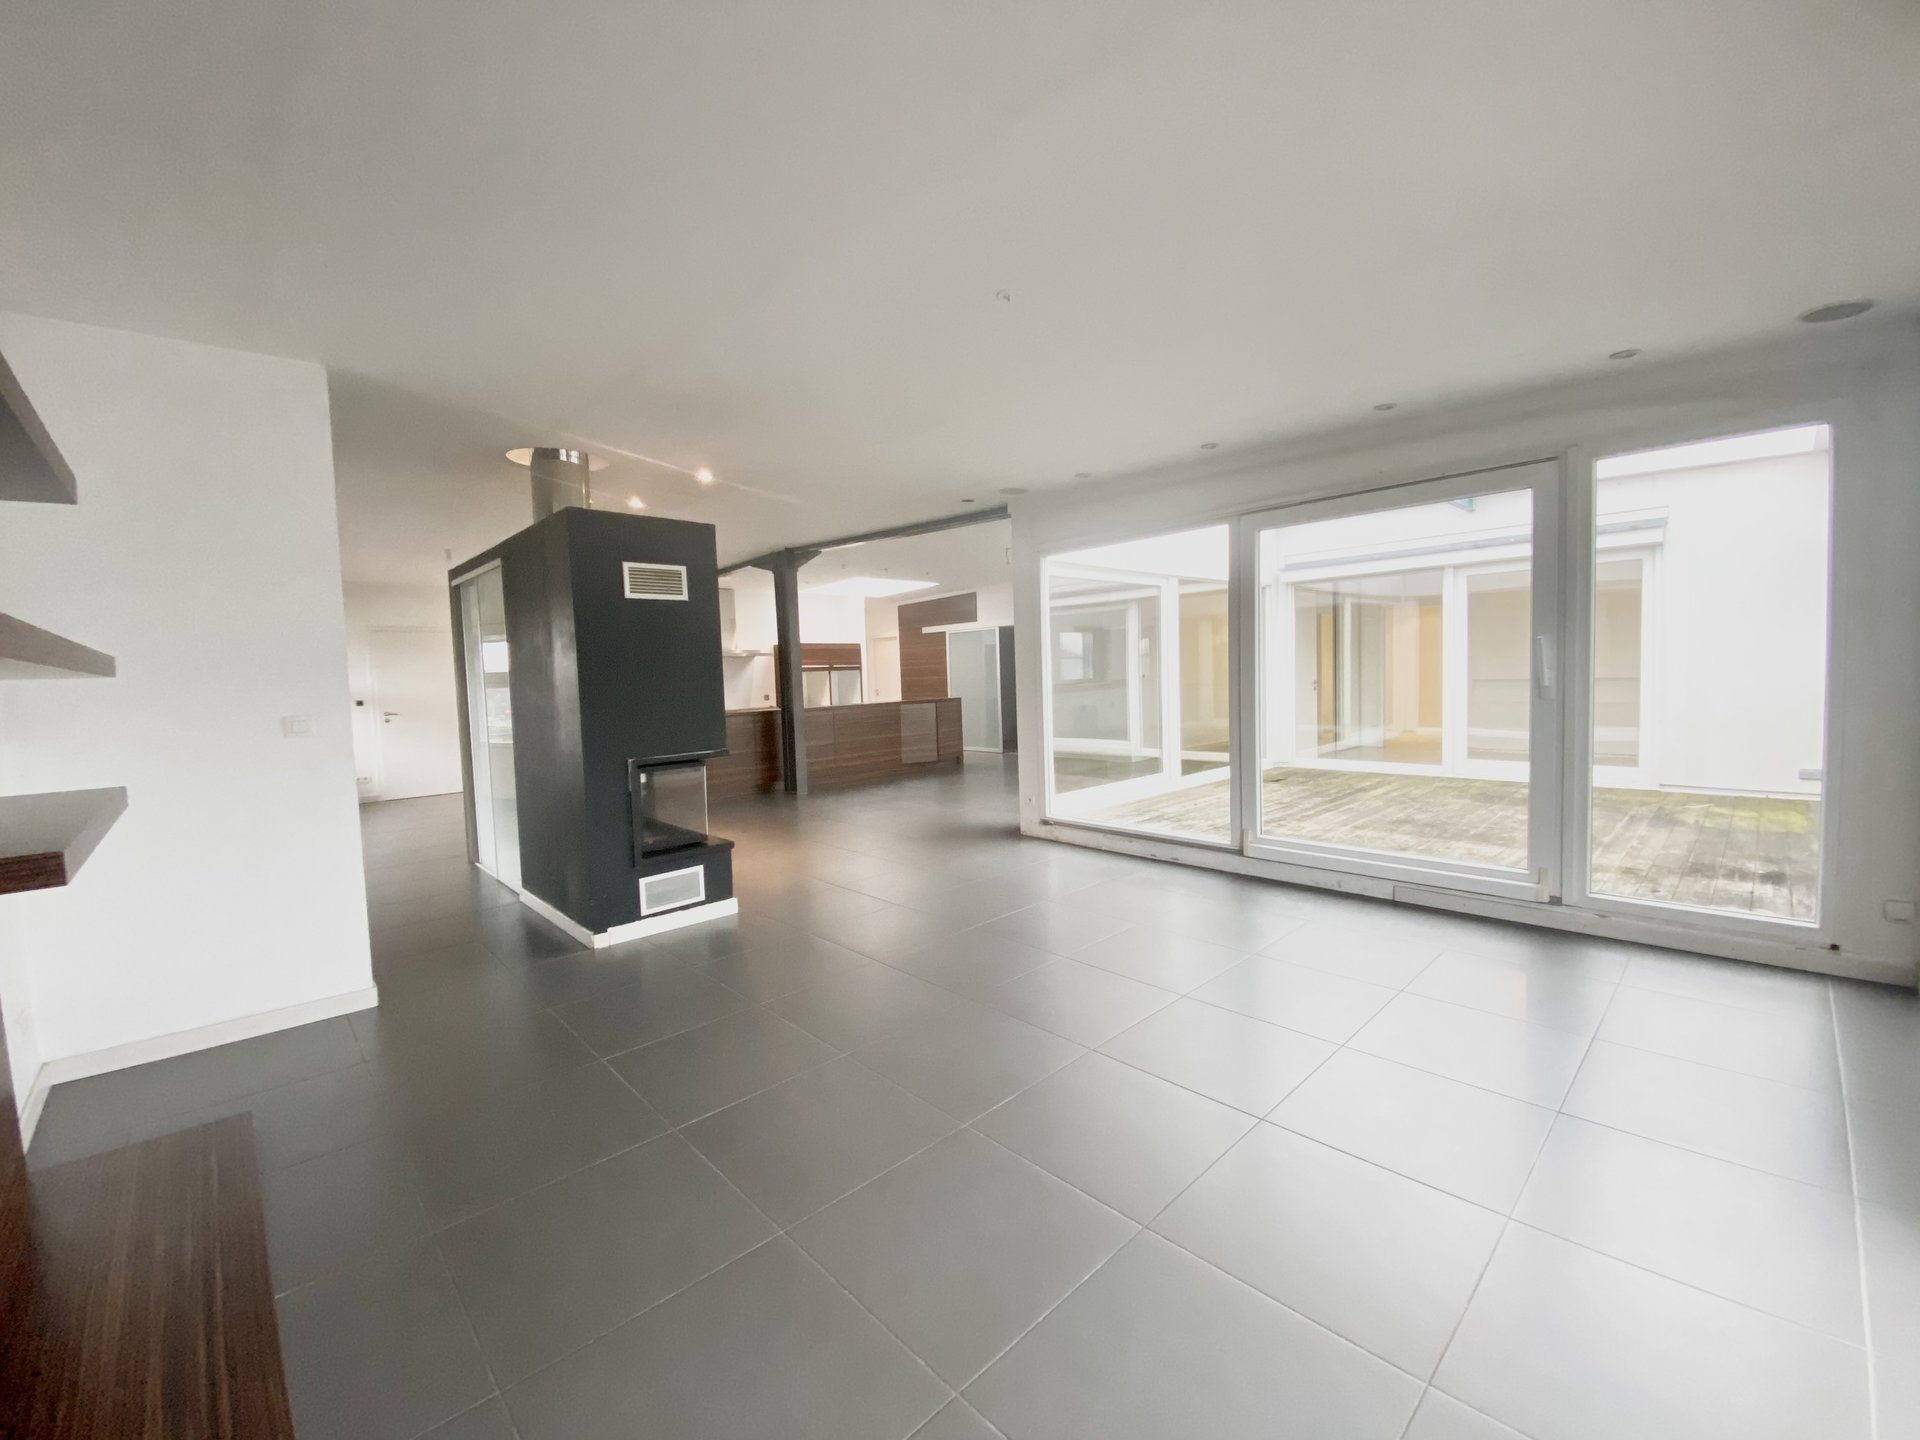 Location Bureau - Souffelweyersheim